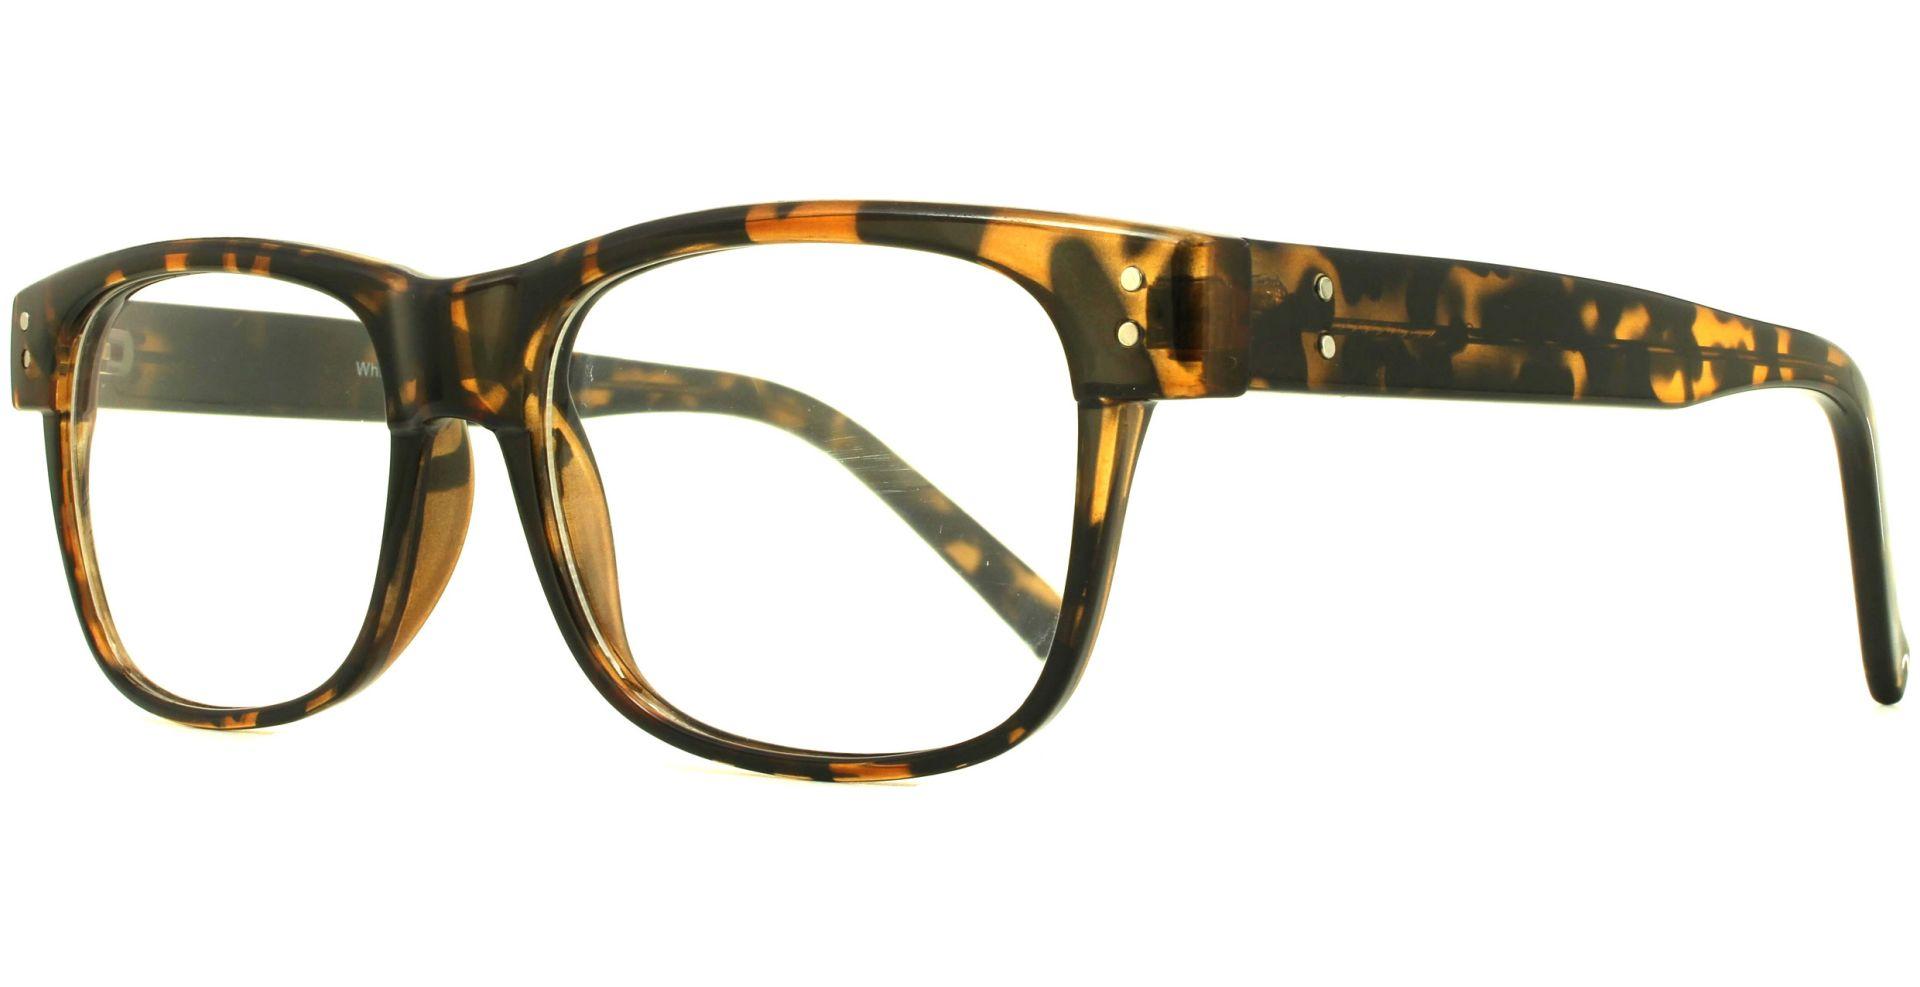 Glasses Direct - Planet 38 5319 Tortoise - von Lensbest